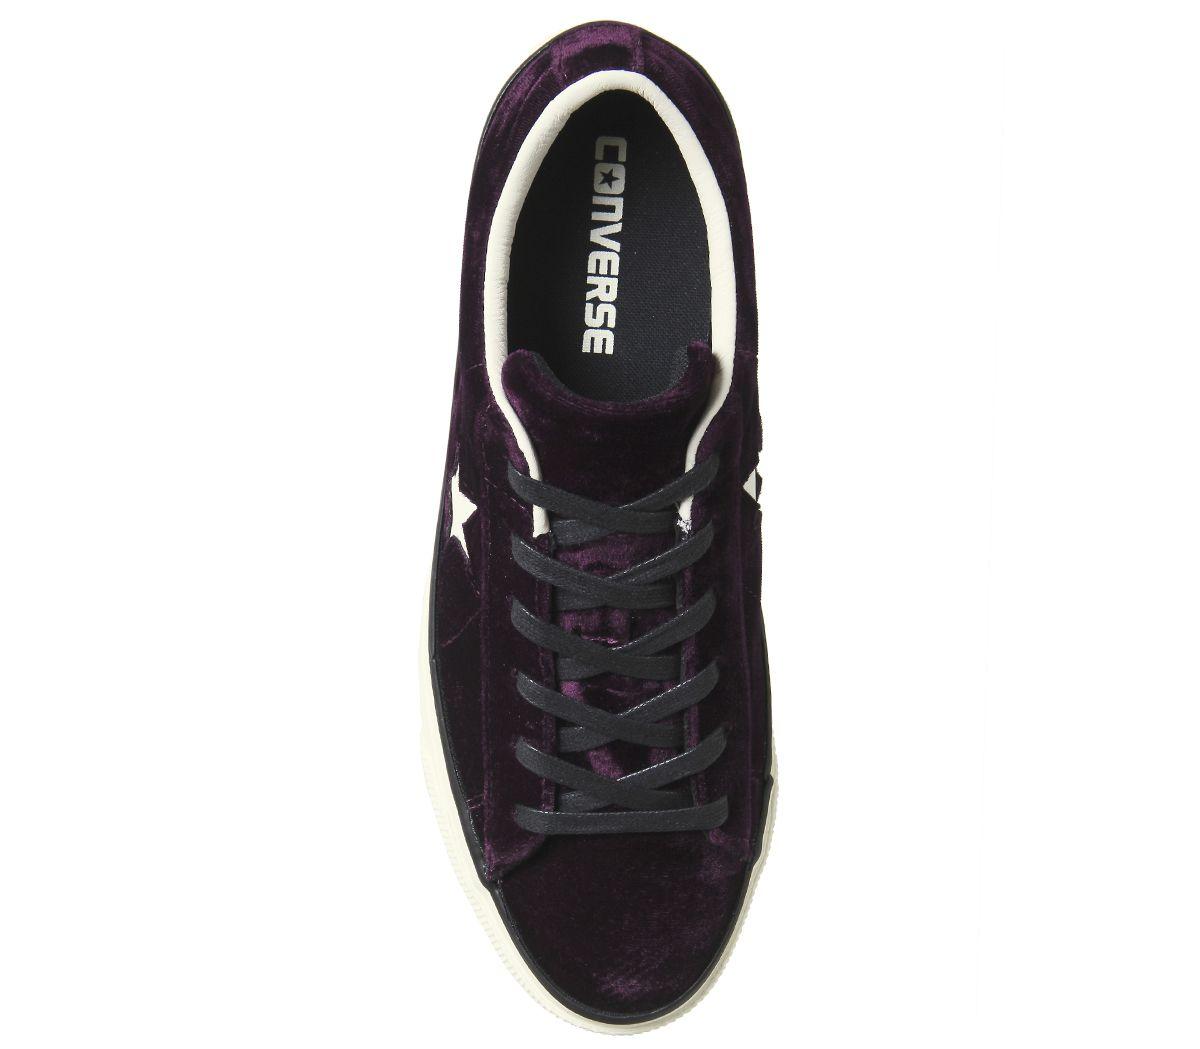 Womens-Converse-One-Star-Platforms-Dark-Sangria-Egret-Velvet-Trainers-Shoes thumbnail 5